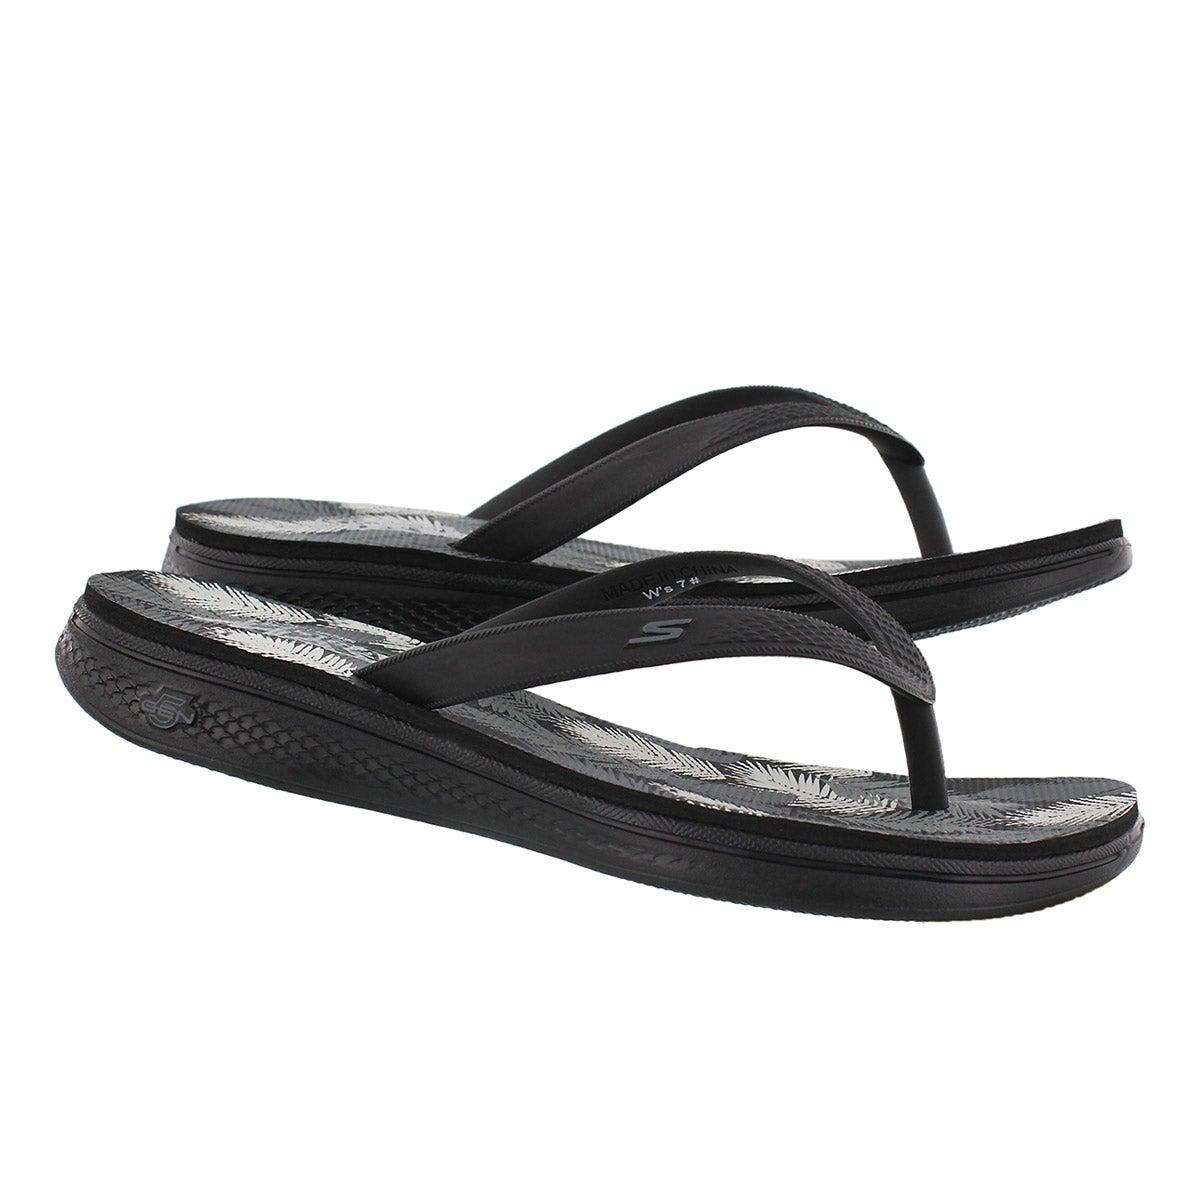 Lds H2 Goga black/grey flip flop